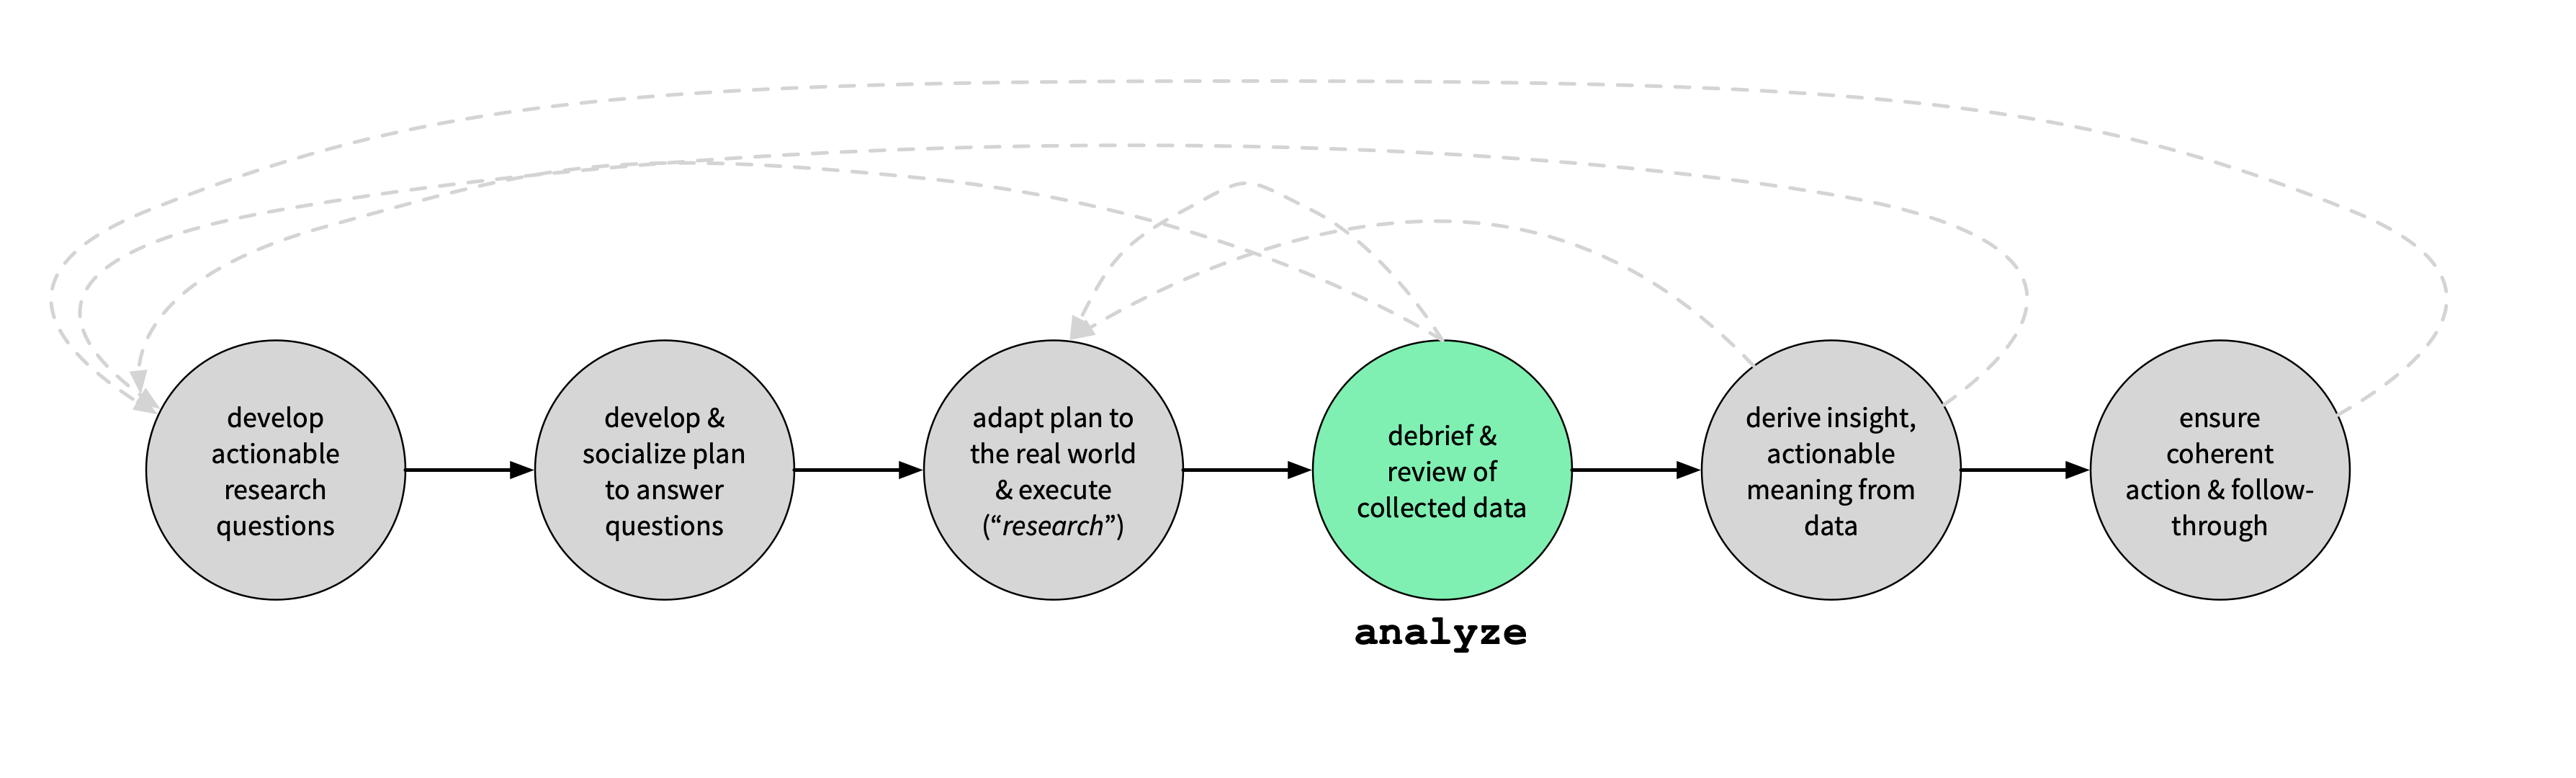 Coordination & Data Management